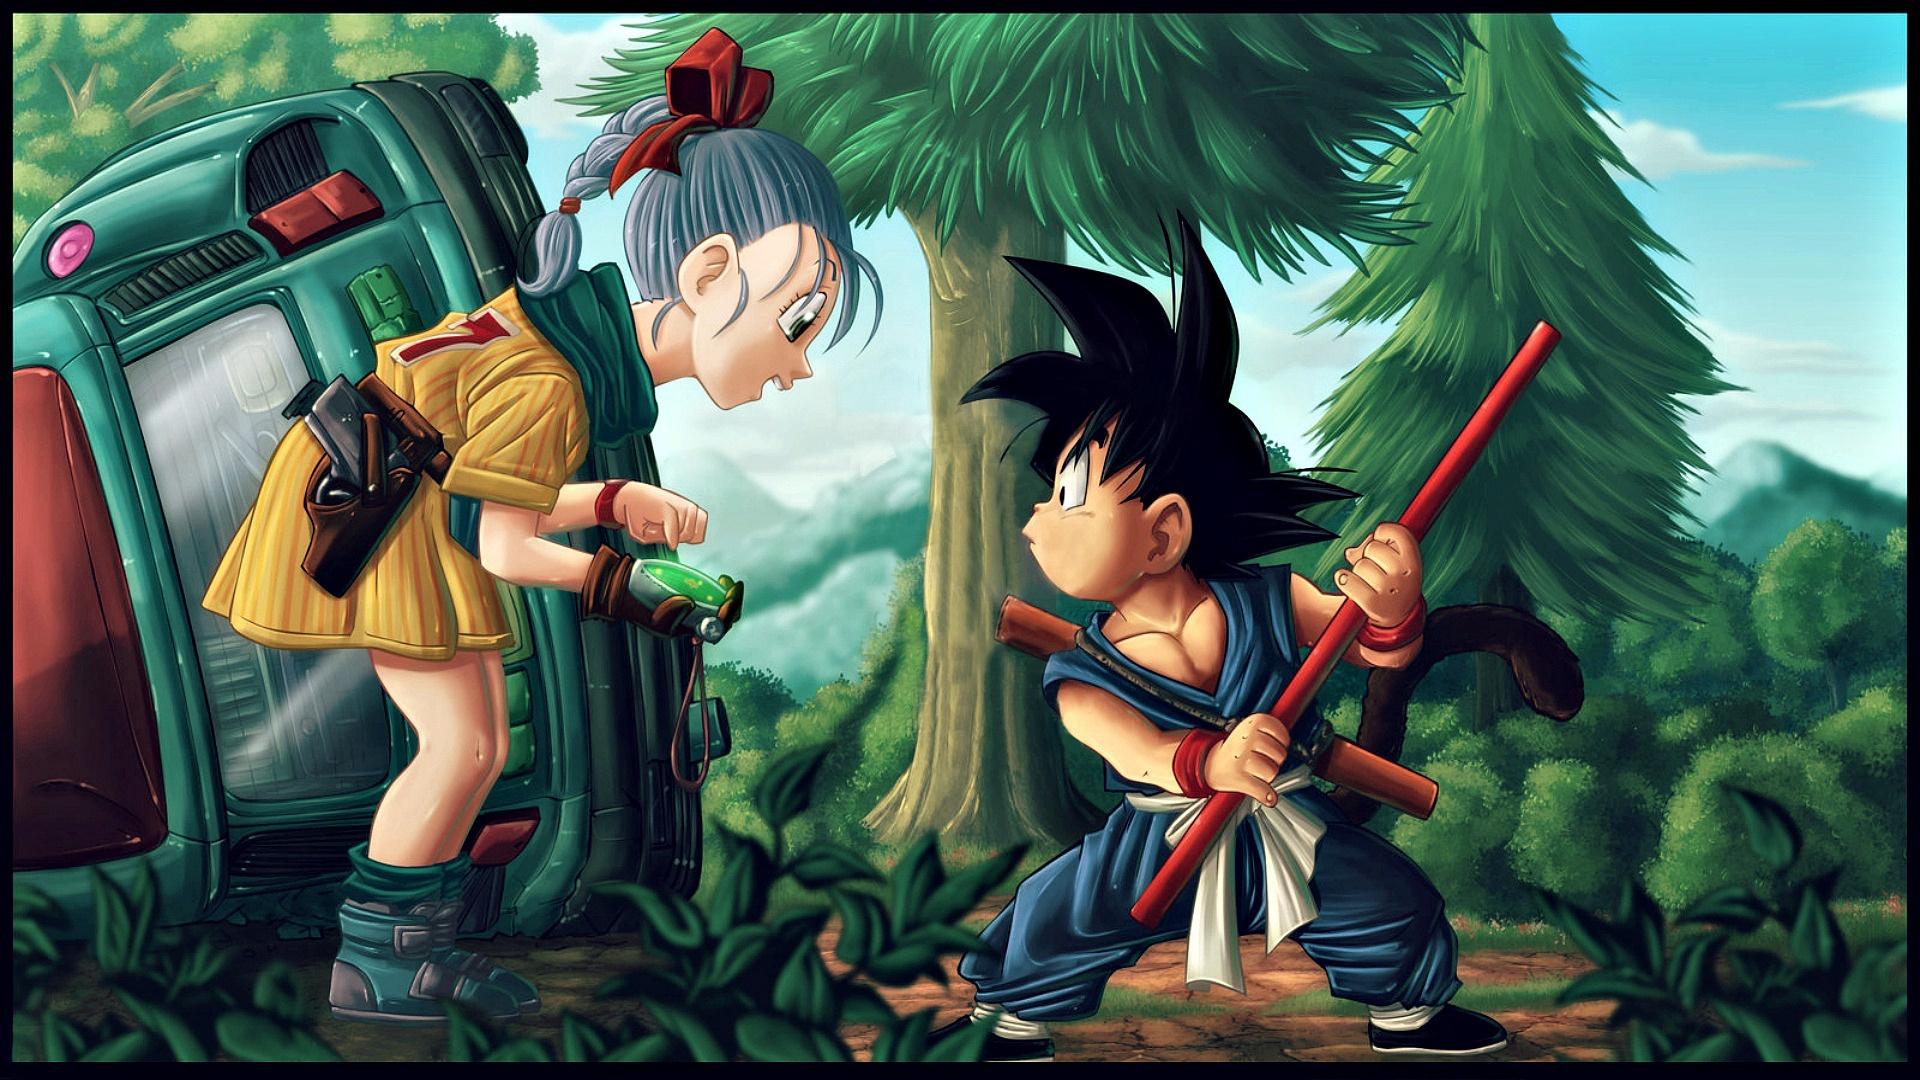 Bulma And Goku Hd Wallpaper Background Image 1920x1080 Id